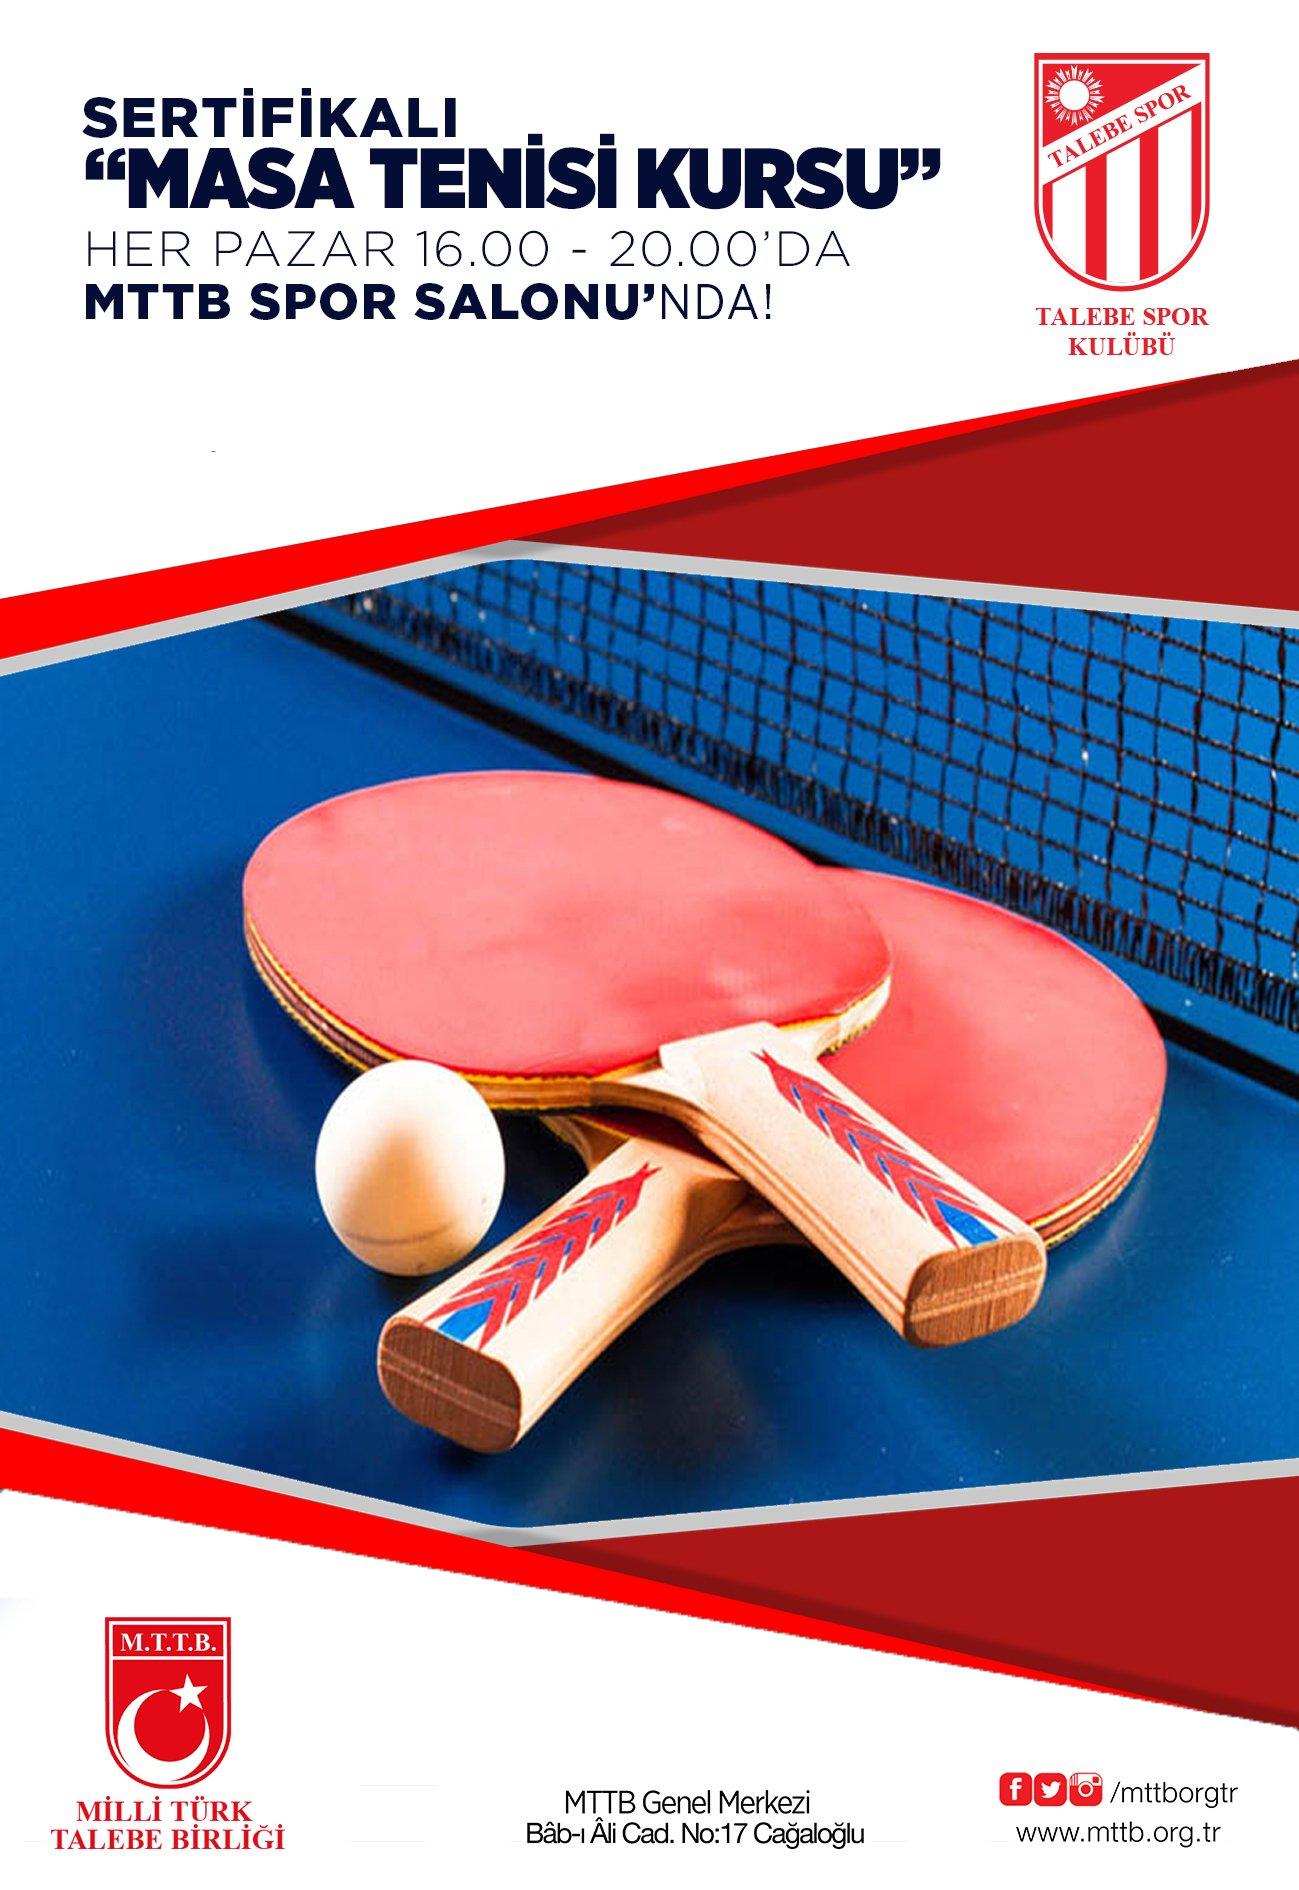 Sertifikalı Masa Tenisi Kursu